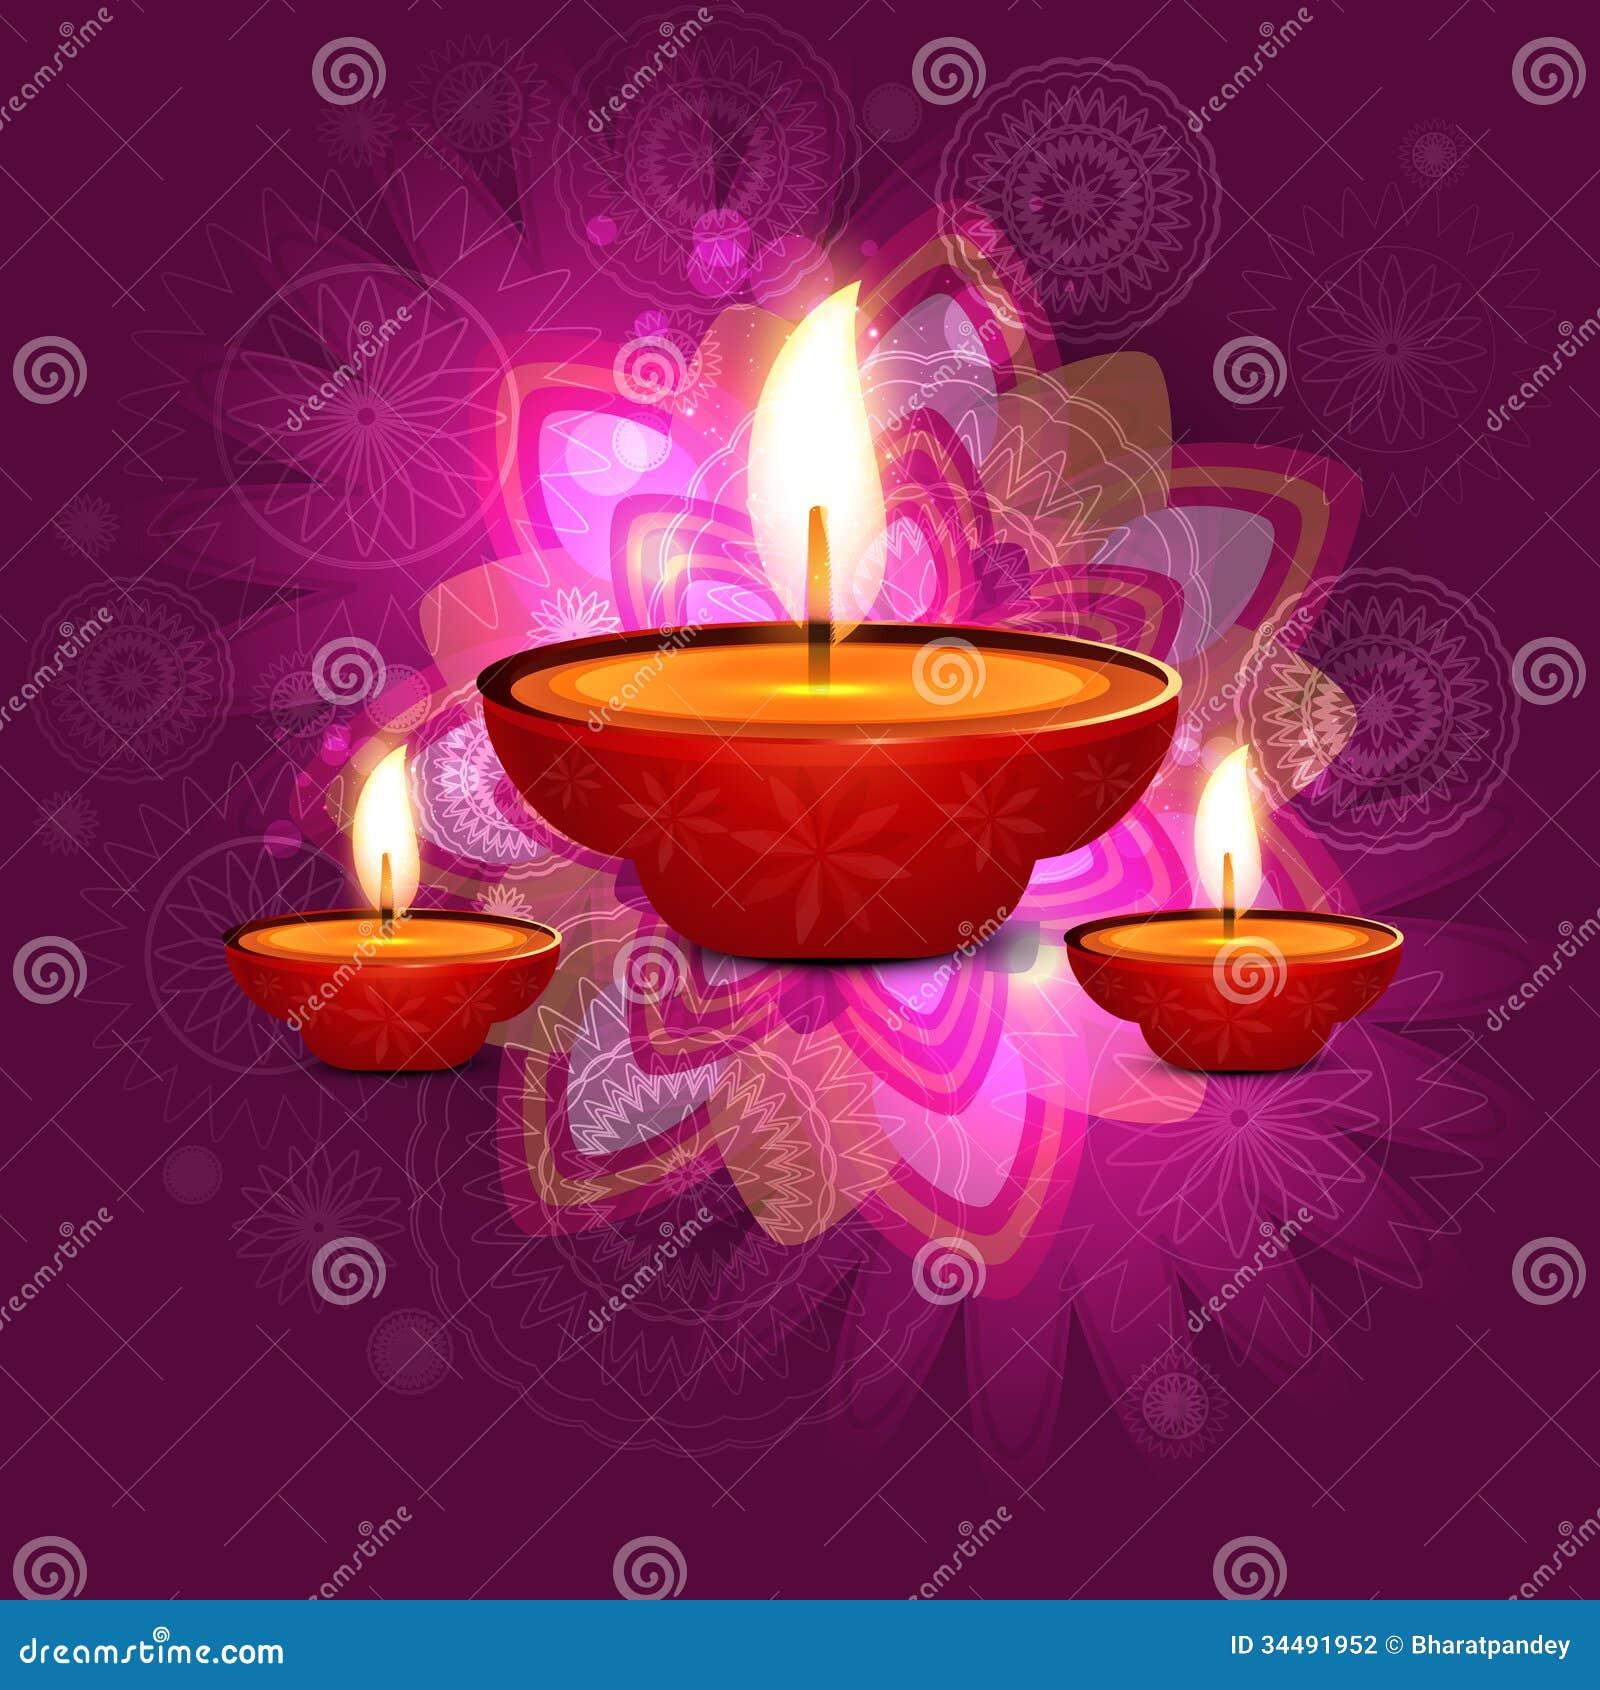 Beautiful diwali greeting card stock illustration illustration of beautiful diwali greeting card m4hsunfo